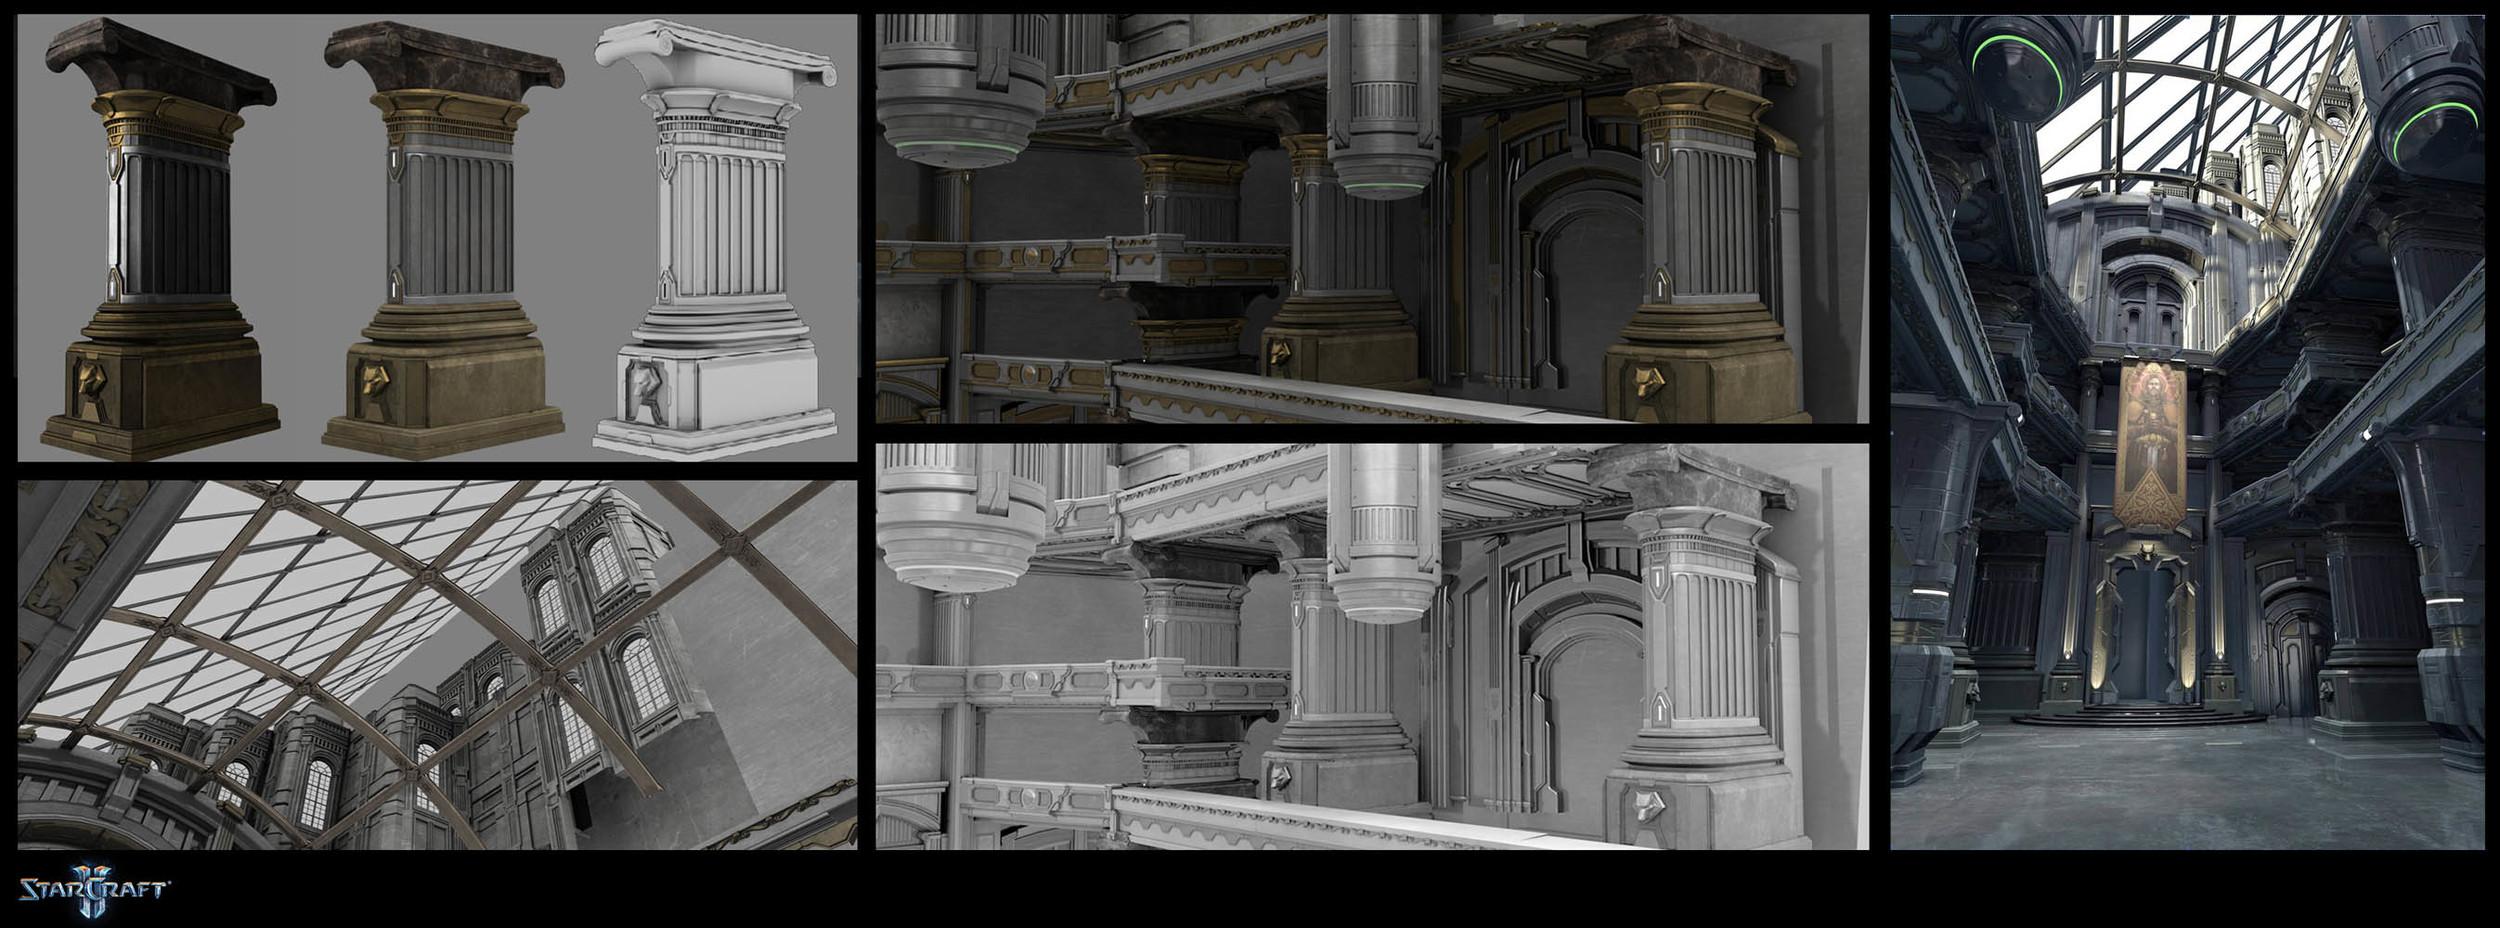 StarCraft2_Pallace_Entry.jpg